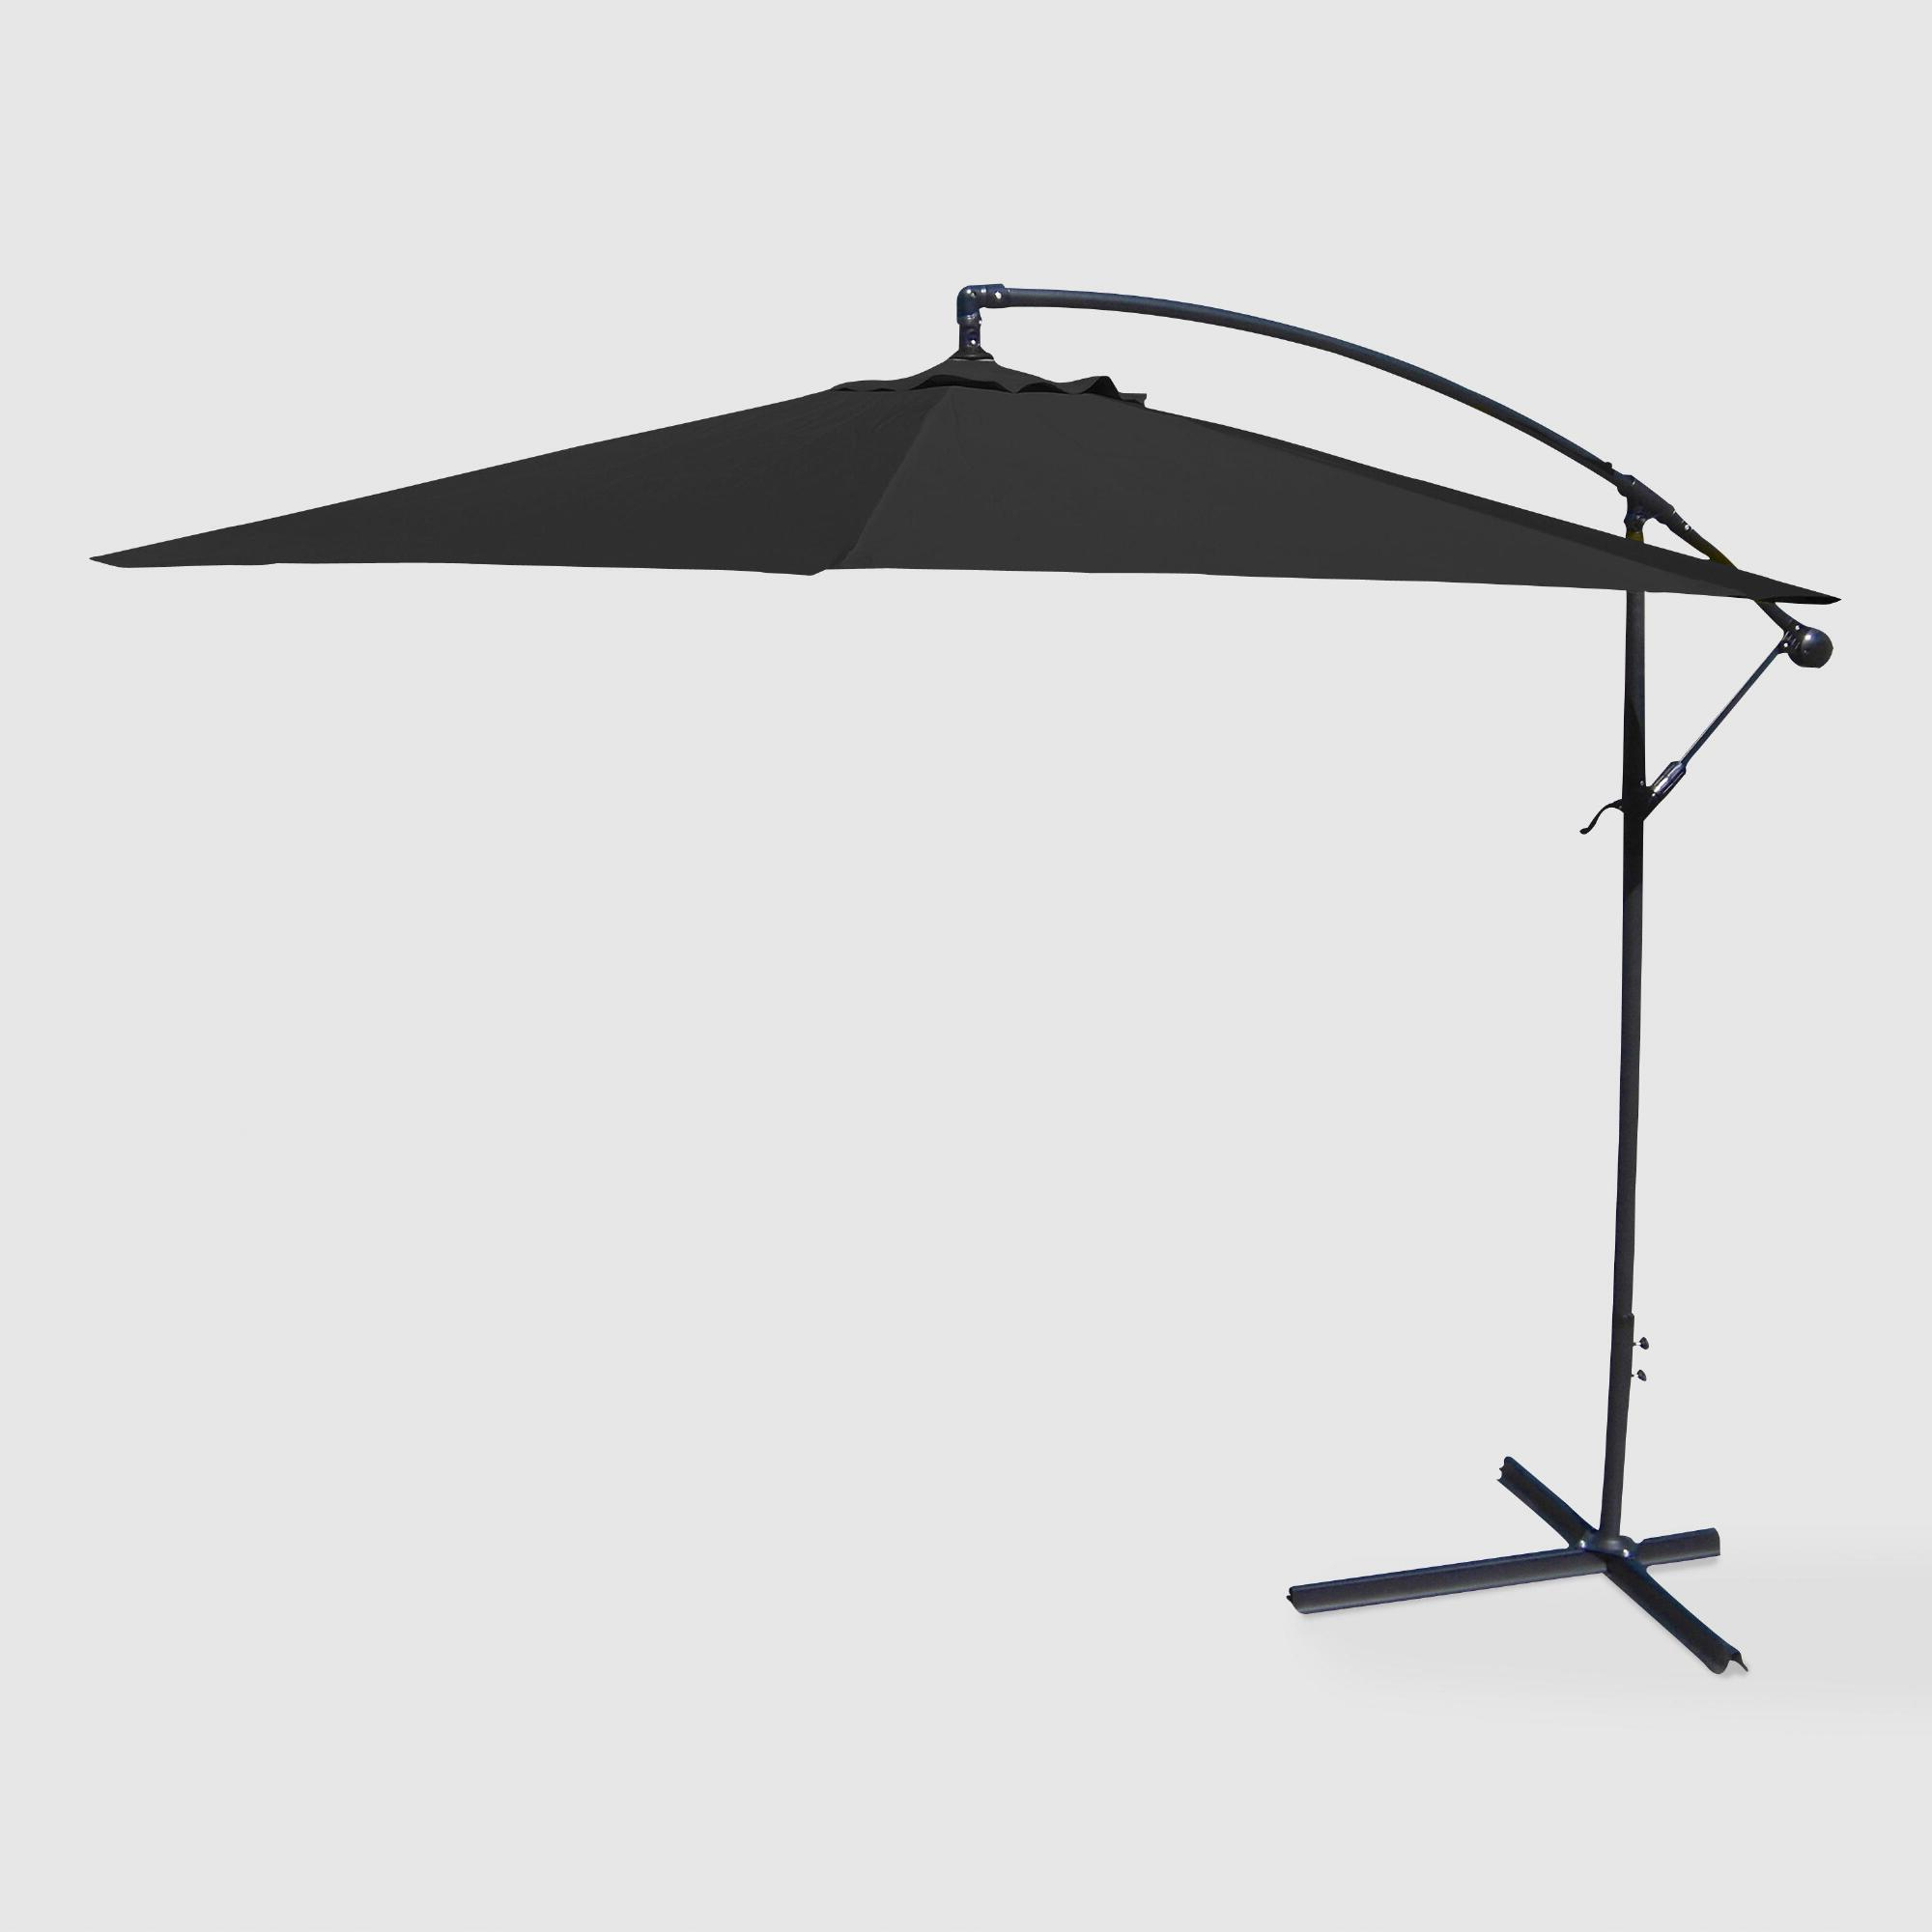 2020 Wardingham Square Cantilever Umbrellas Intended For Black Cantilever Outdoor Patio Umbrella – Fabricworld Market In (Gallery 19 of 20)